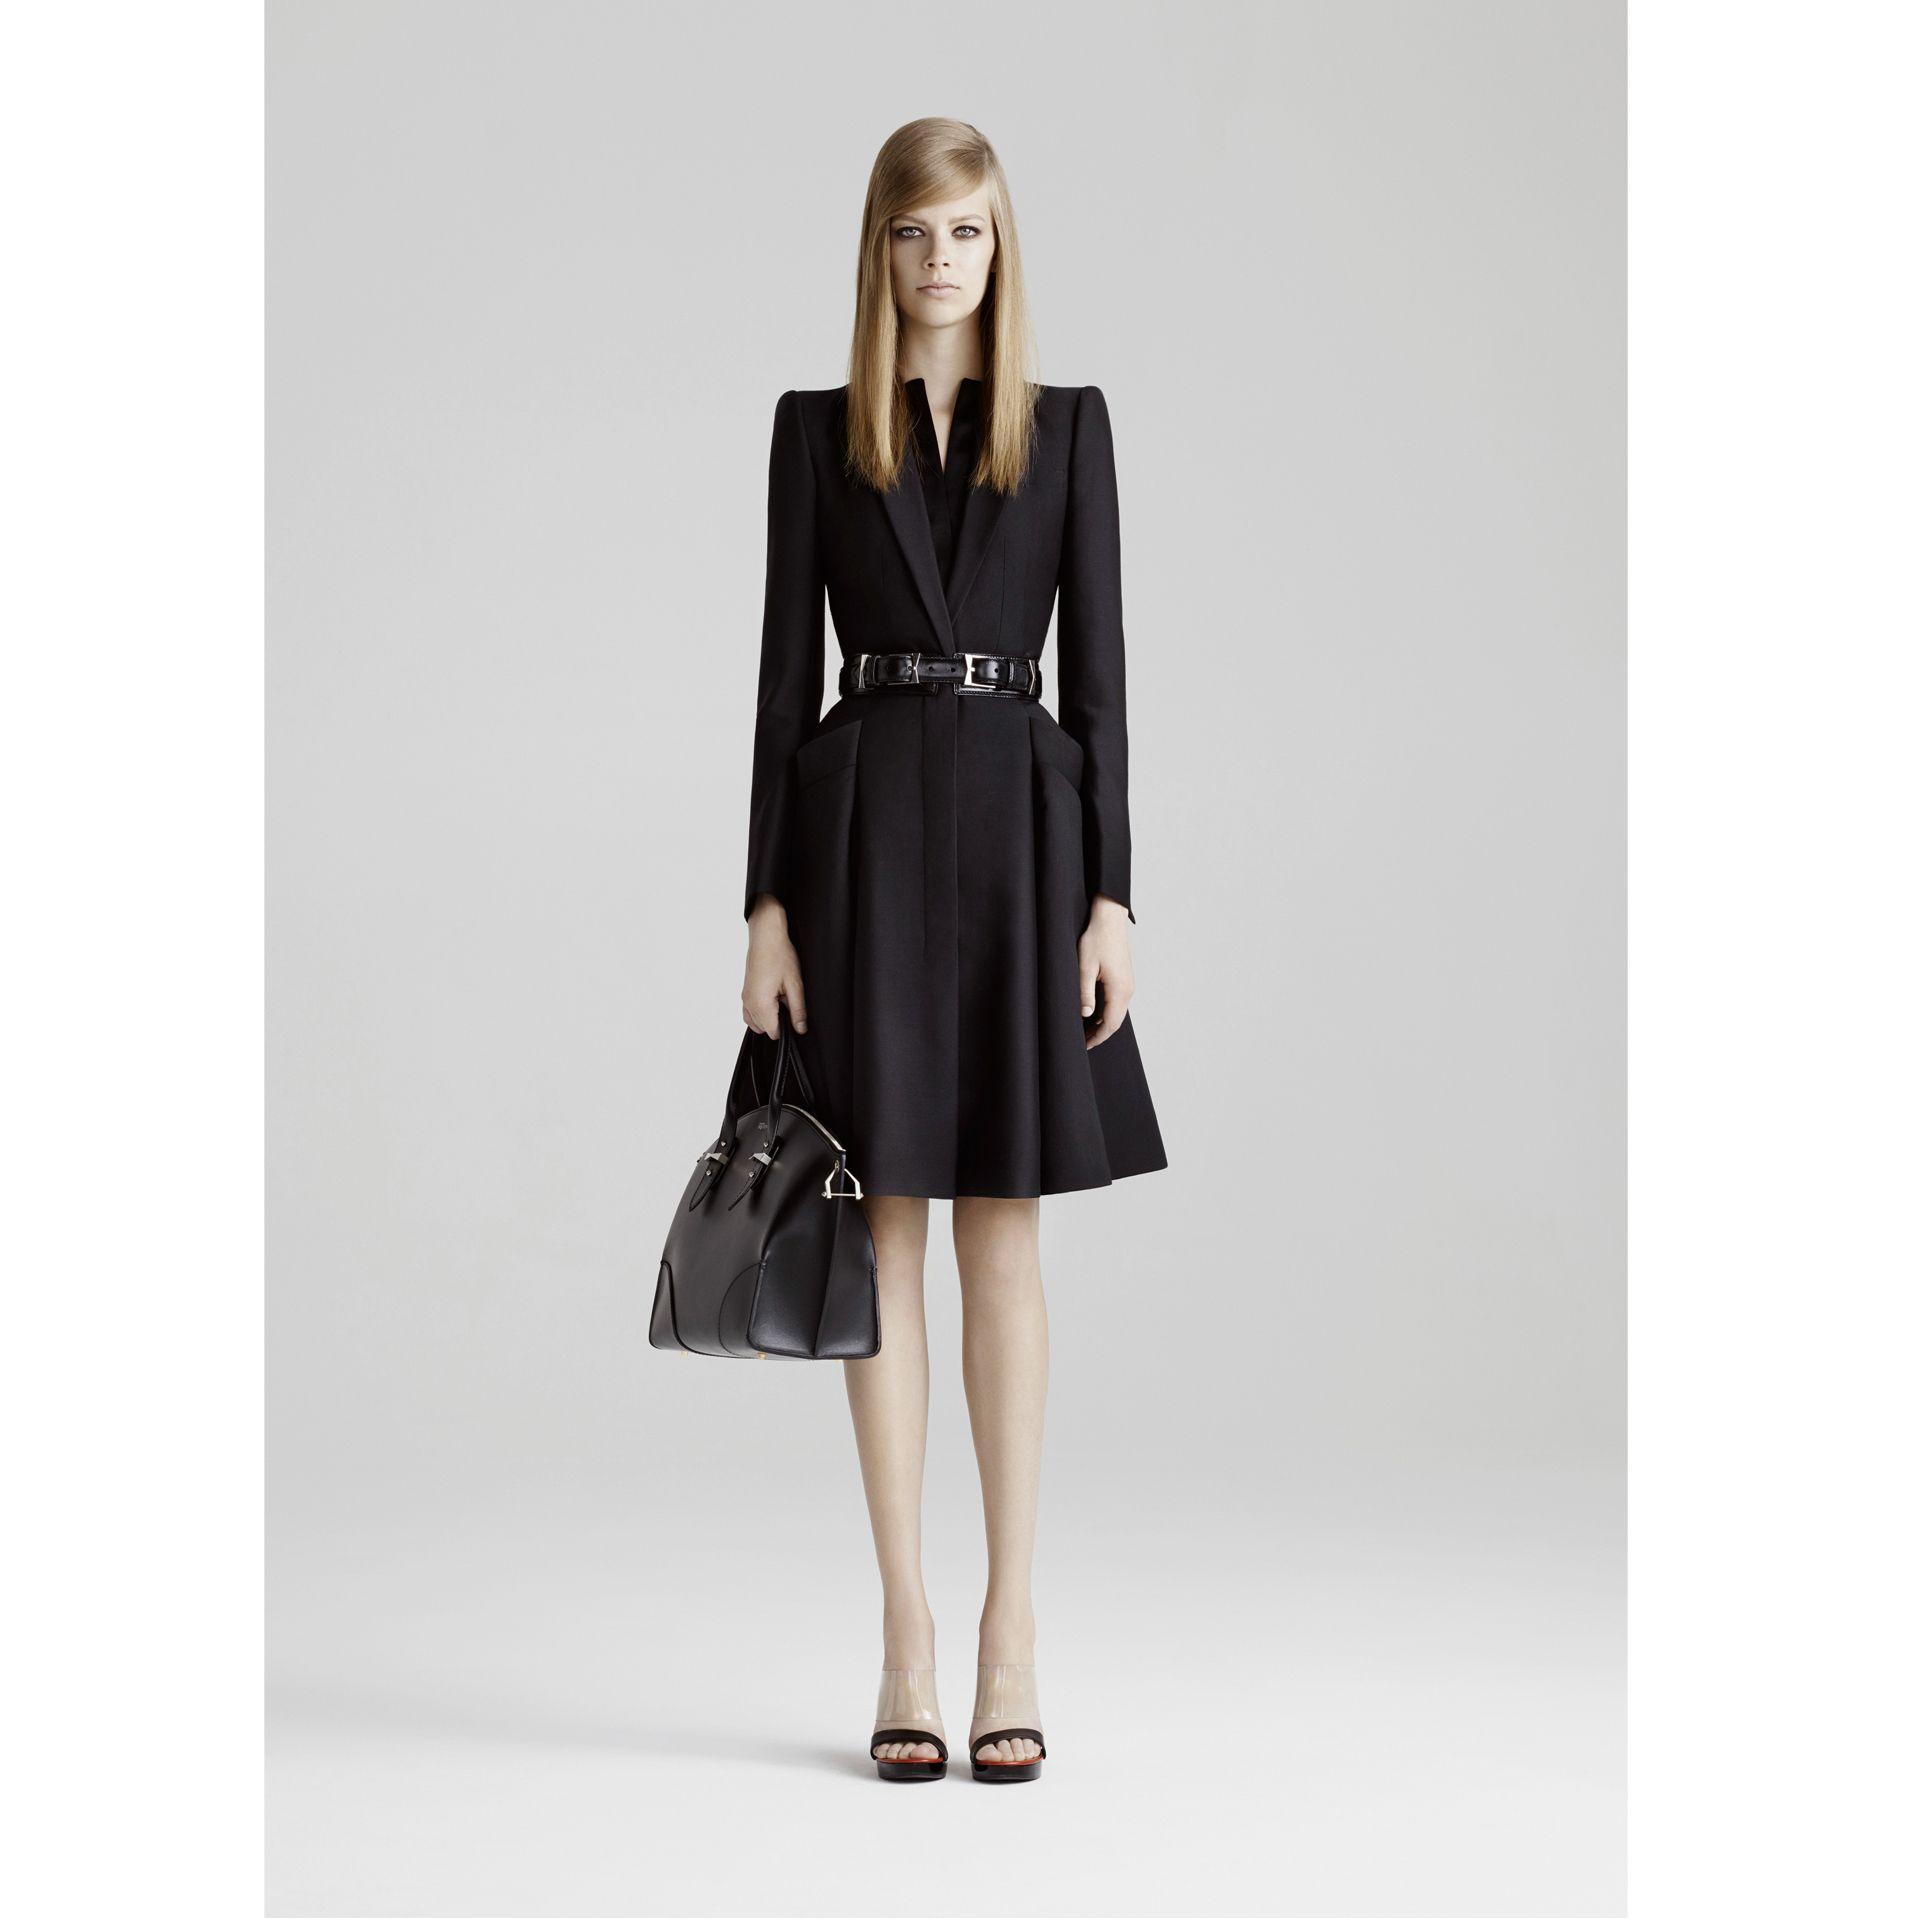 Alexander Mcqueen Womenswear Pre Spring Summer 2015